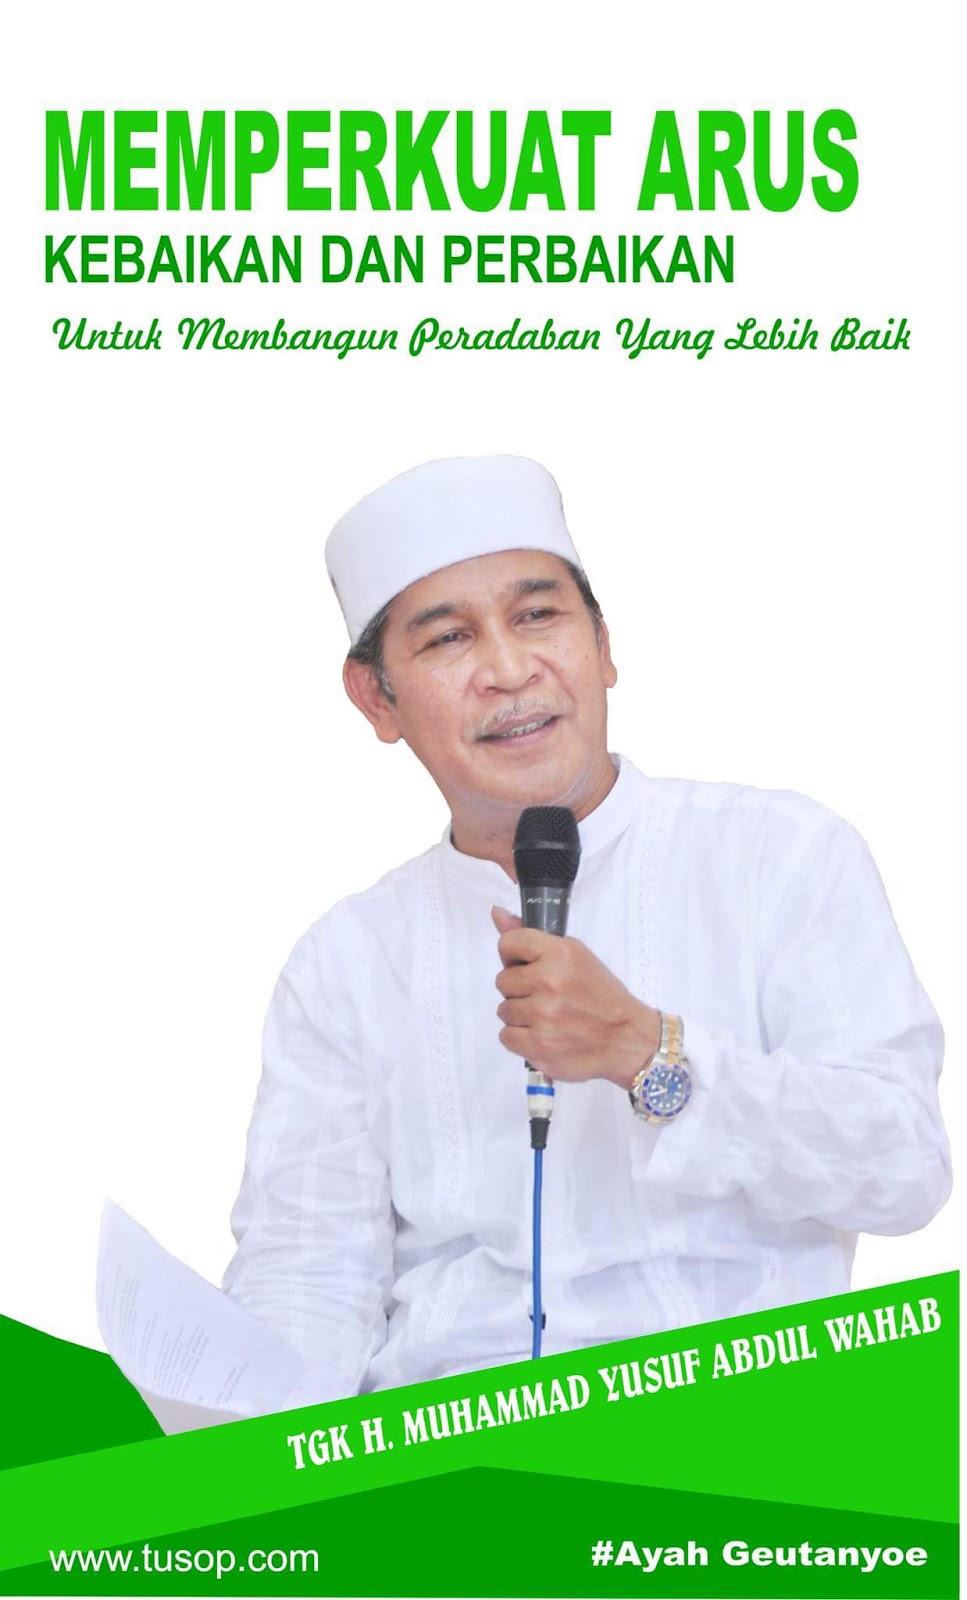 Tgk H. Muhammad Yusuf A Wahab - Tu Sop Jeunieb